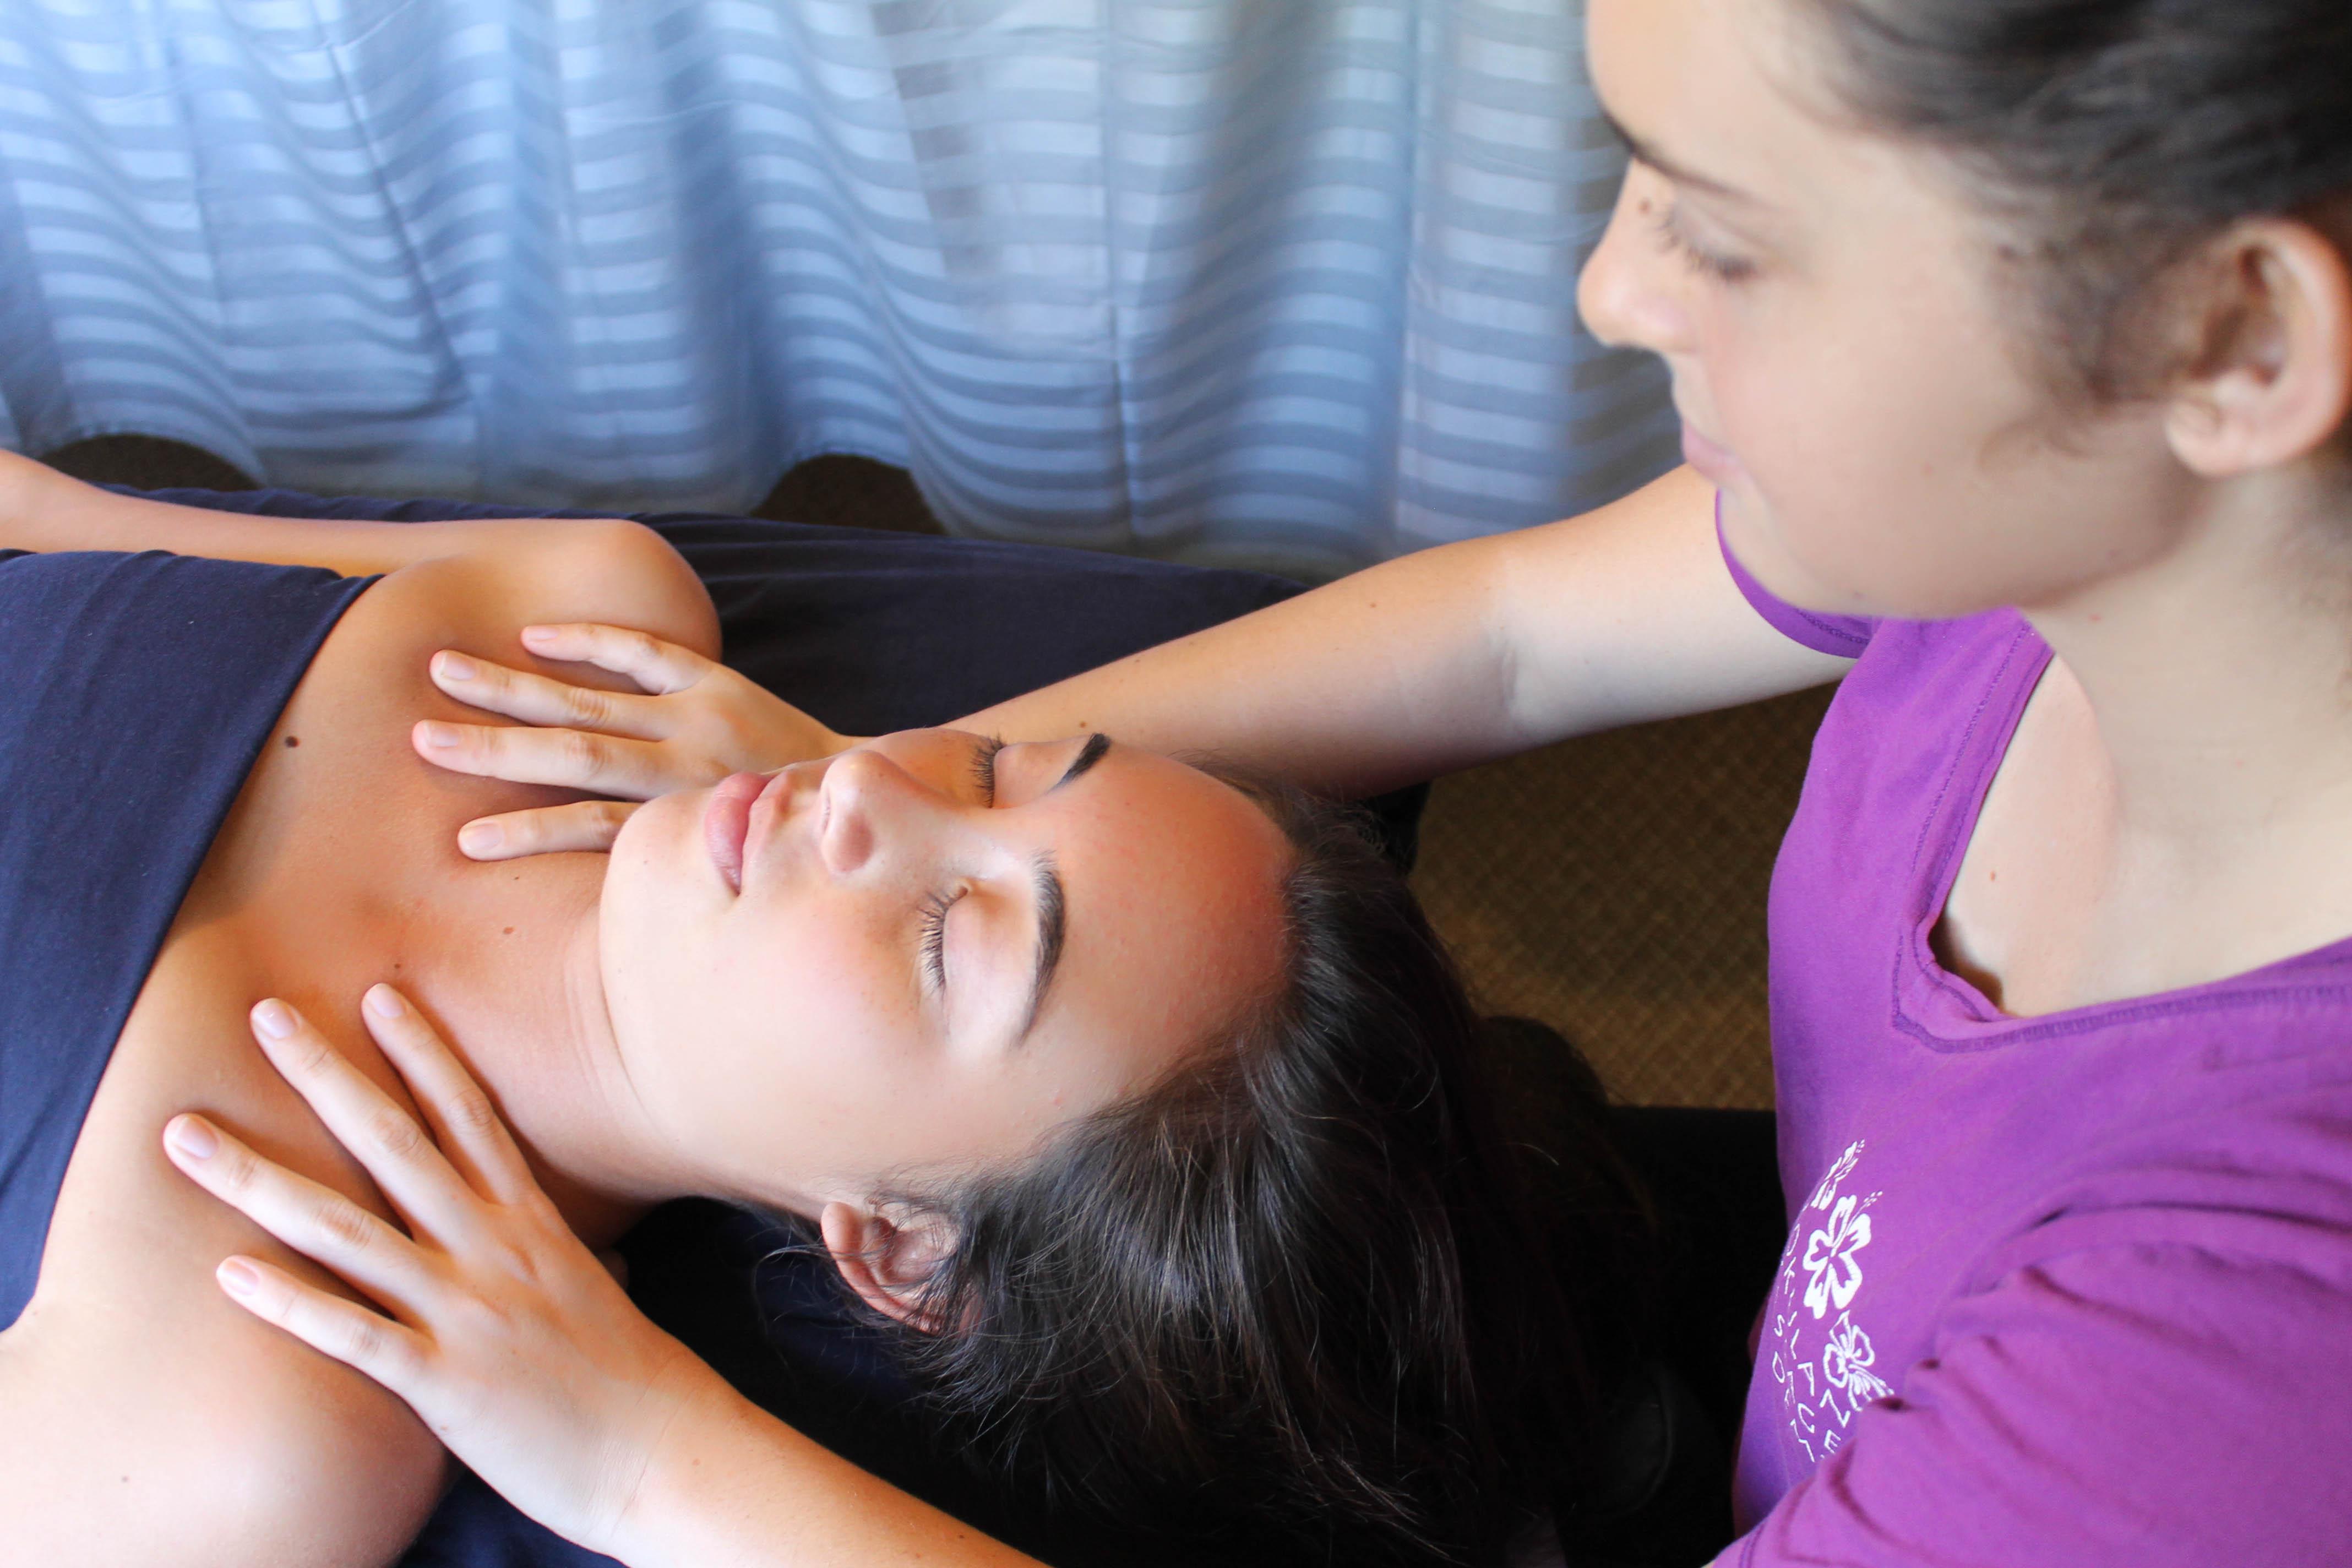 Om Hklani Massage Academy Hklani Massage Academy-1516